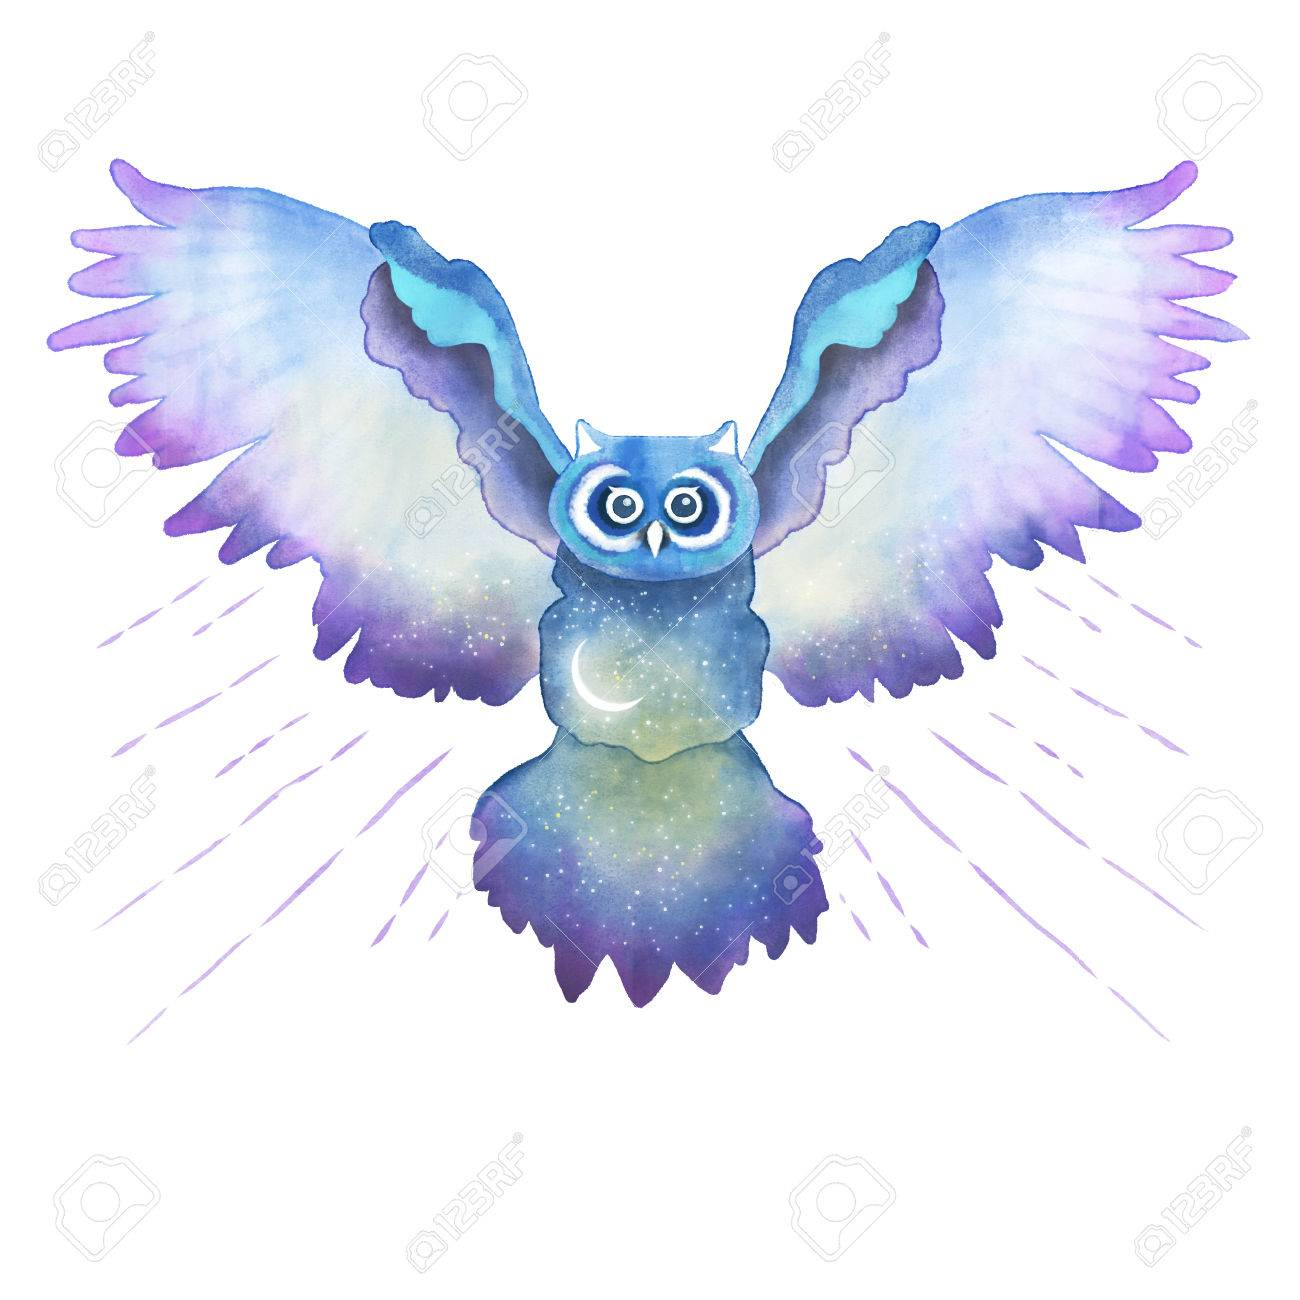 Shirt design resolution - Watercolor Owl Illustration In High Resolution T Shirt Fresh Design Stock Illustration